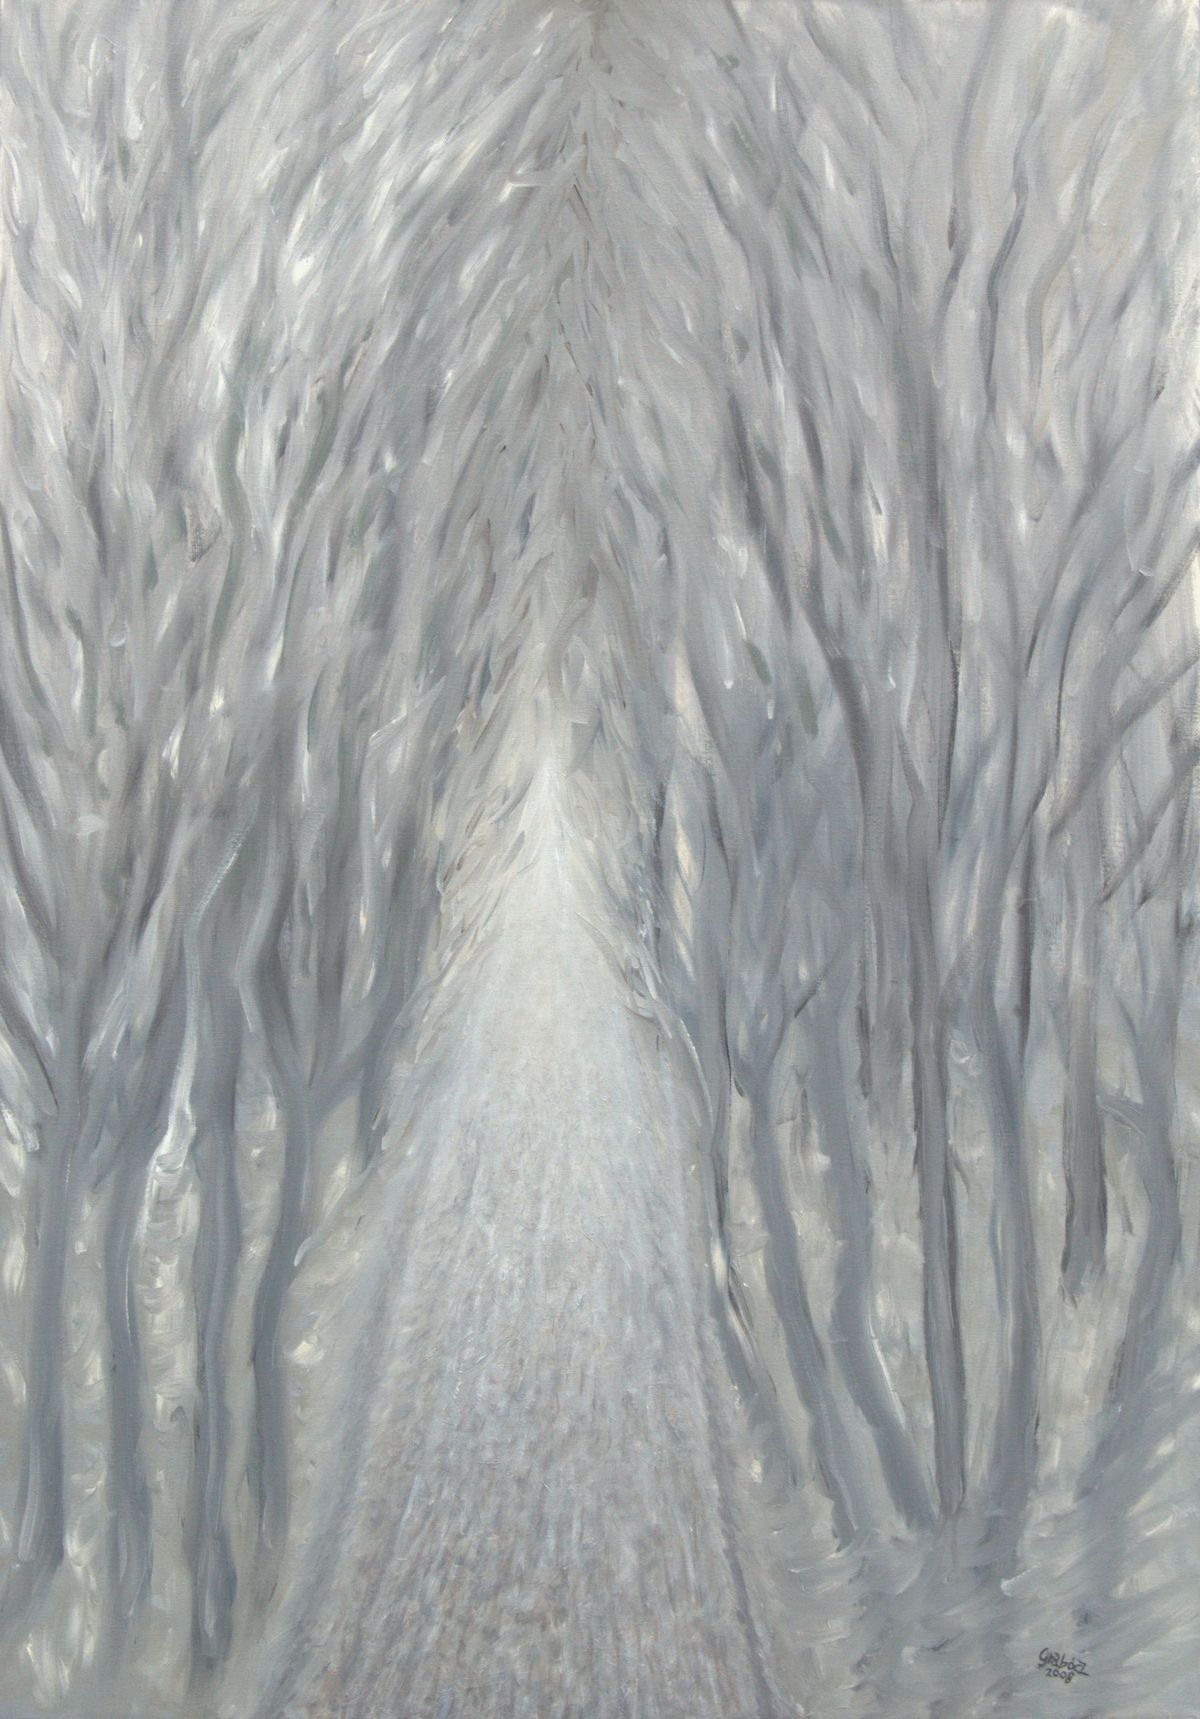 25 (olaj, vászon, 70x100 cm), 2008-10